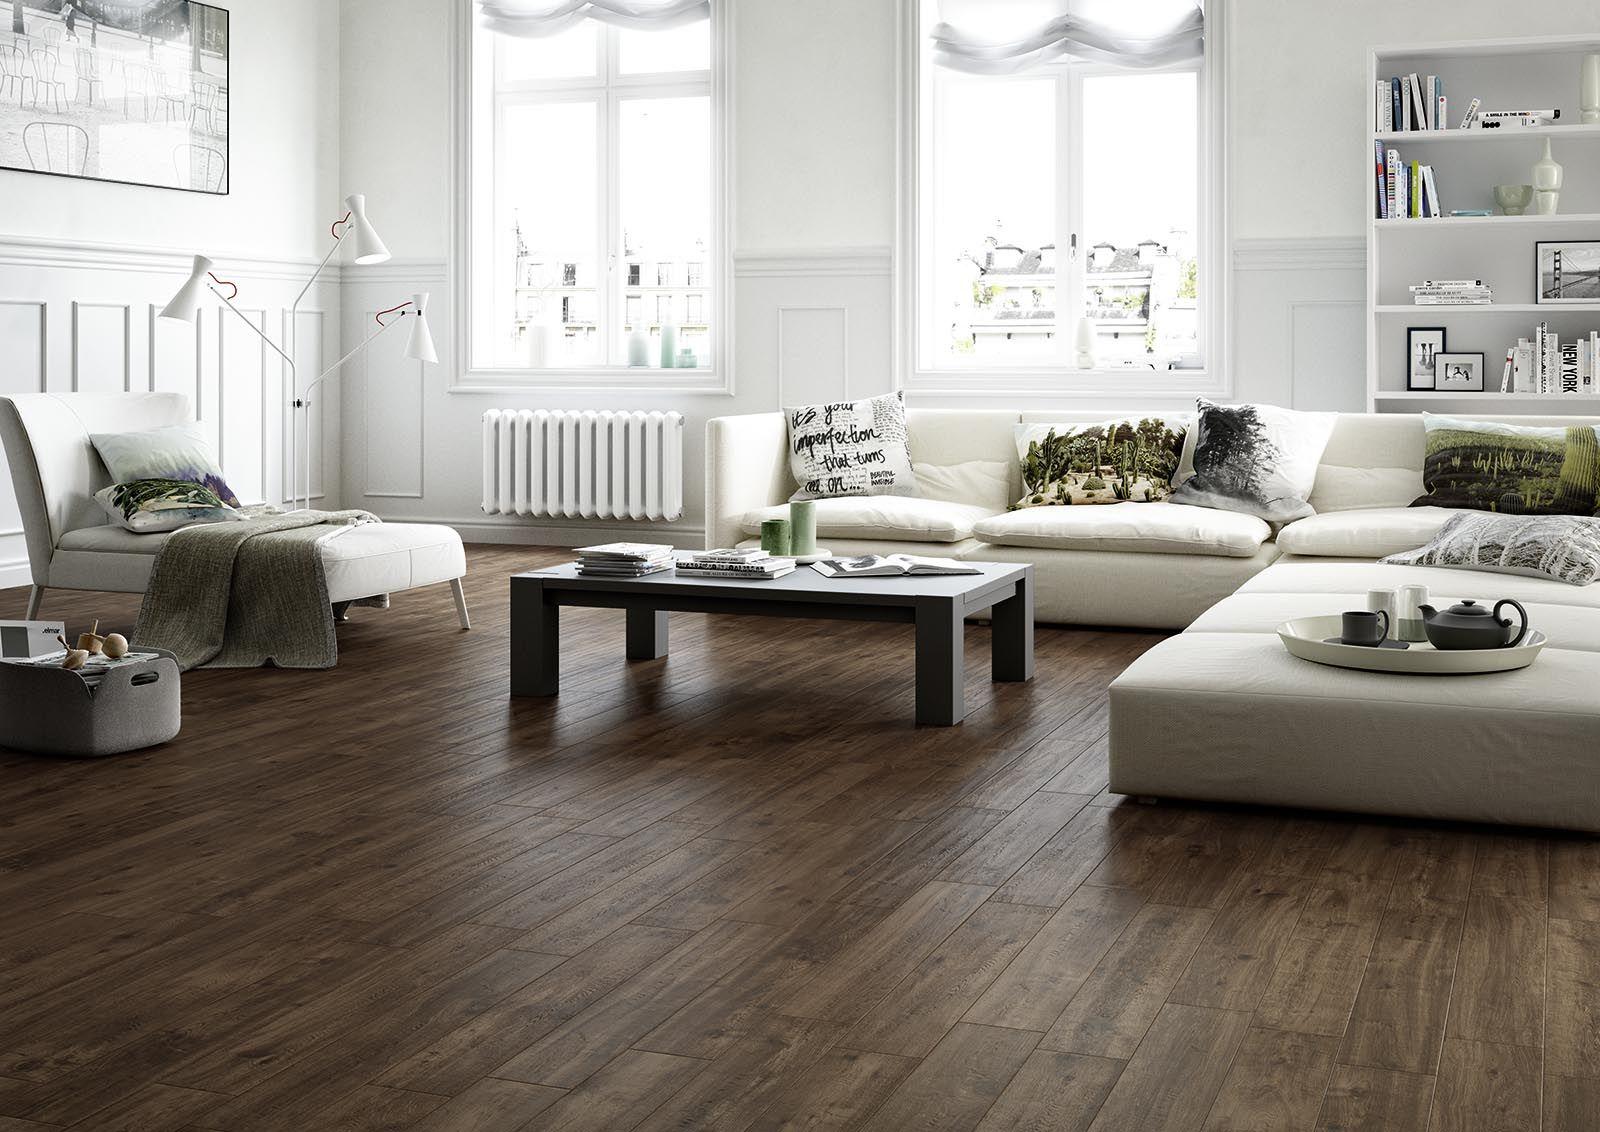 houtlook tegels woonkamer tg wonen pinterest parket tegels